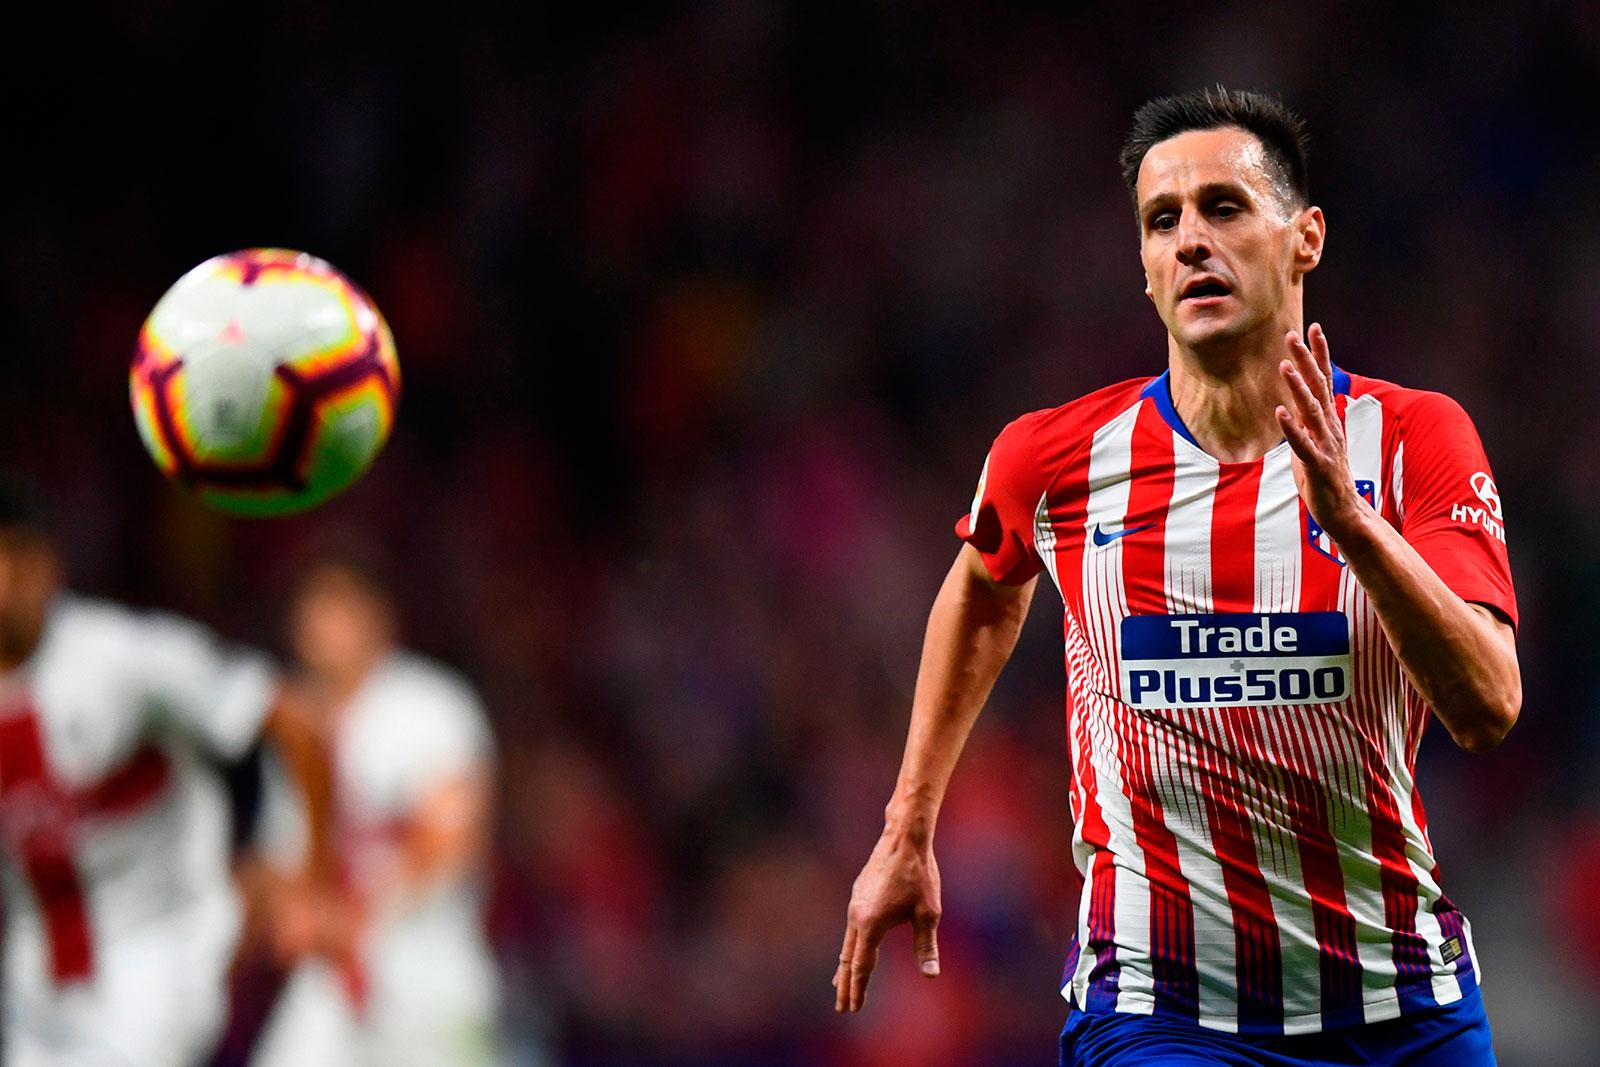 Nikola Kalinić during Atlético Madrid-SD Huesca at Wanda Metropolitano on September 25, 2018. (GABRIEL BOUYS/AFP/Getty Images)